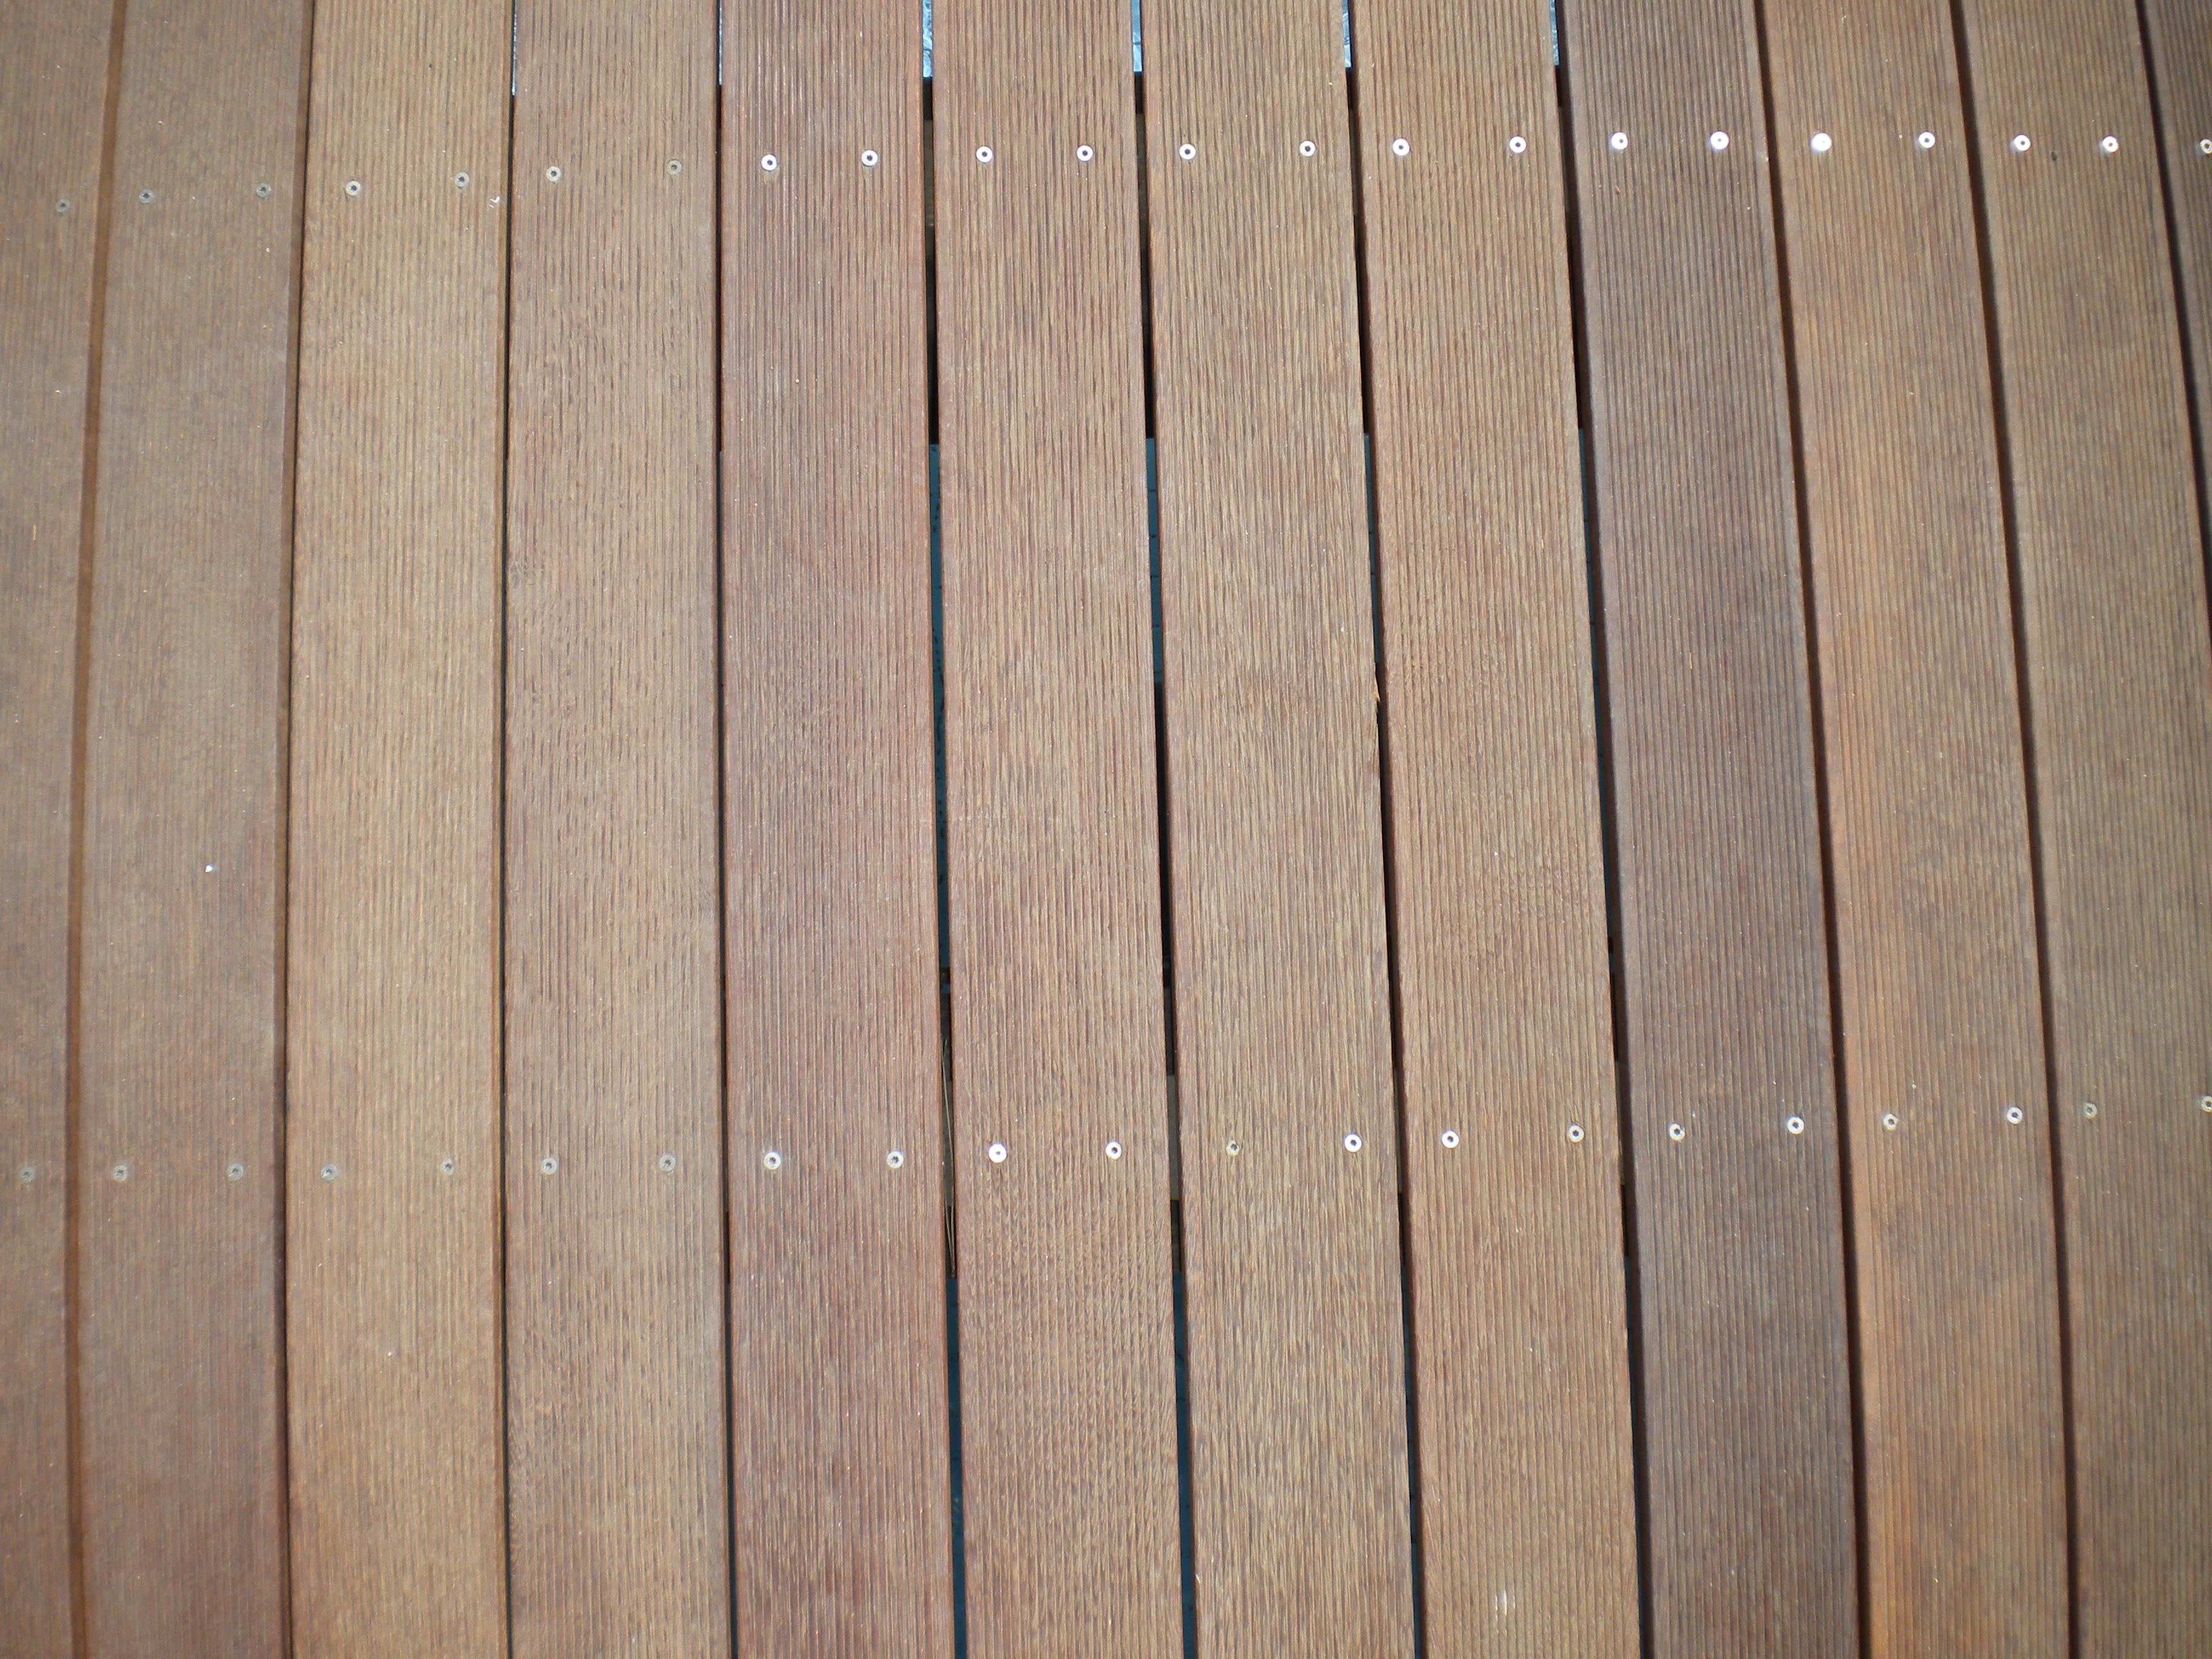 Deck-uri lemn - Sucupira Red SELVA FLOORS - Poza 3